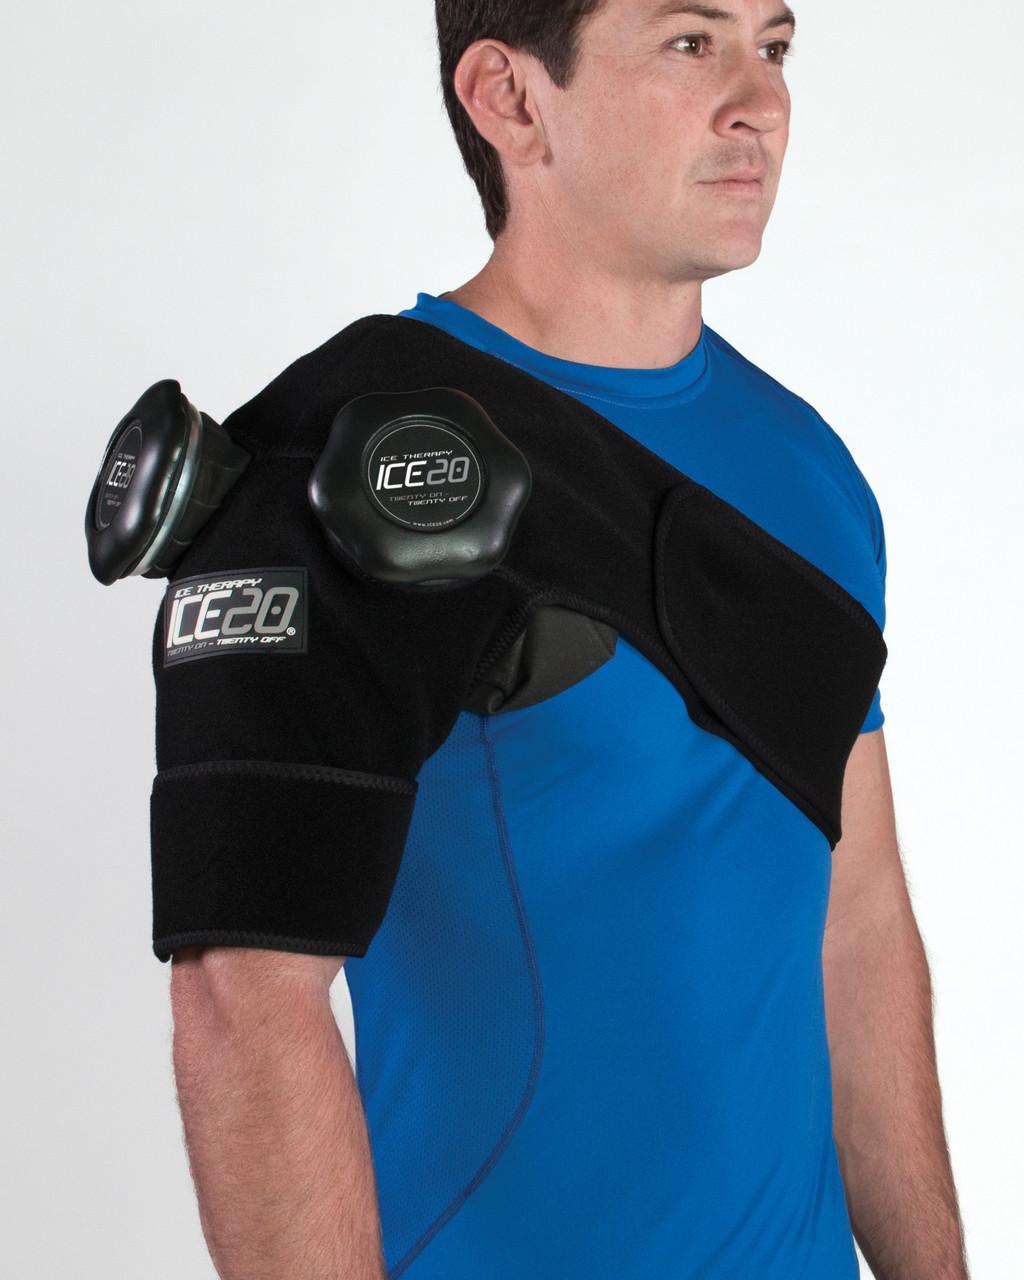 Ice20 Double Shoulder Compression Wrap